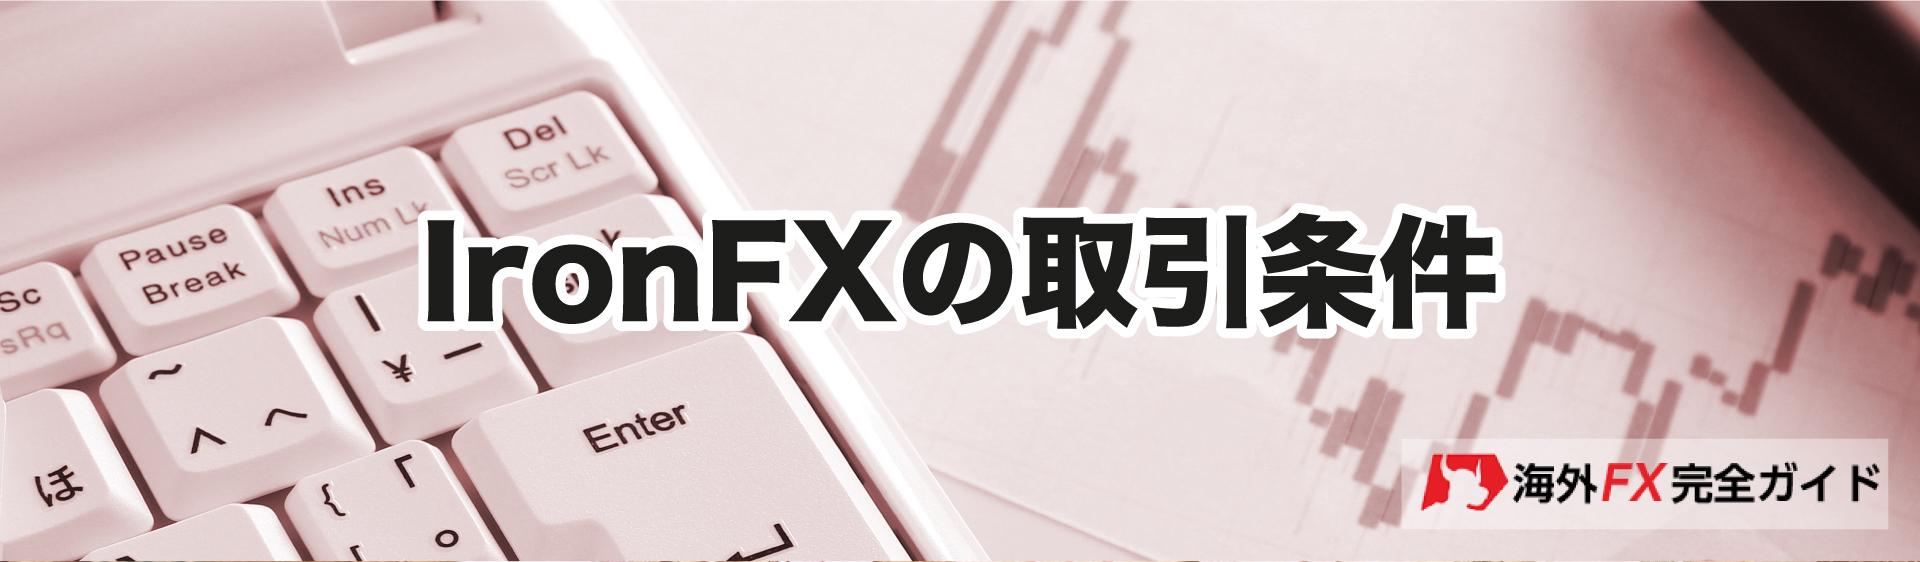 IronFX-Head-2-1